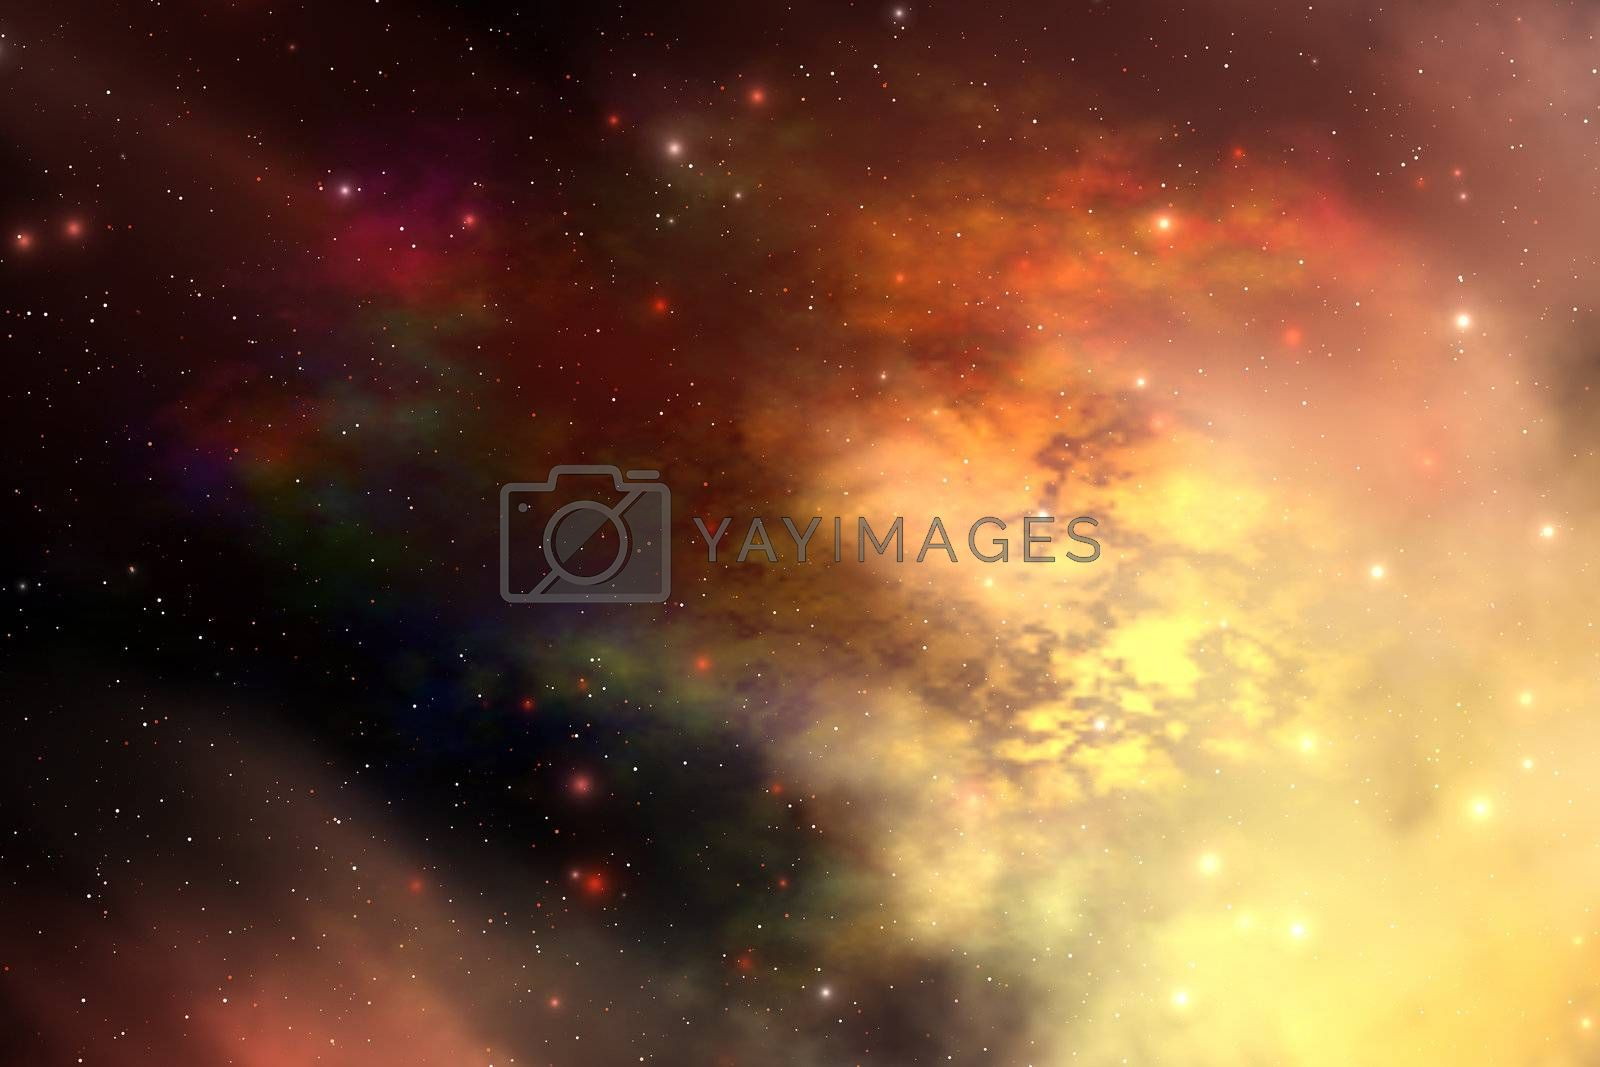 Royalty free image of REFLECTION NEBULA by Catmando